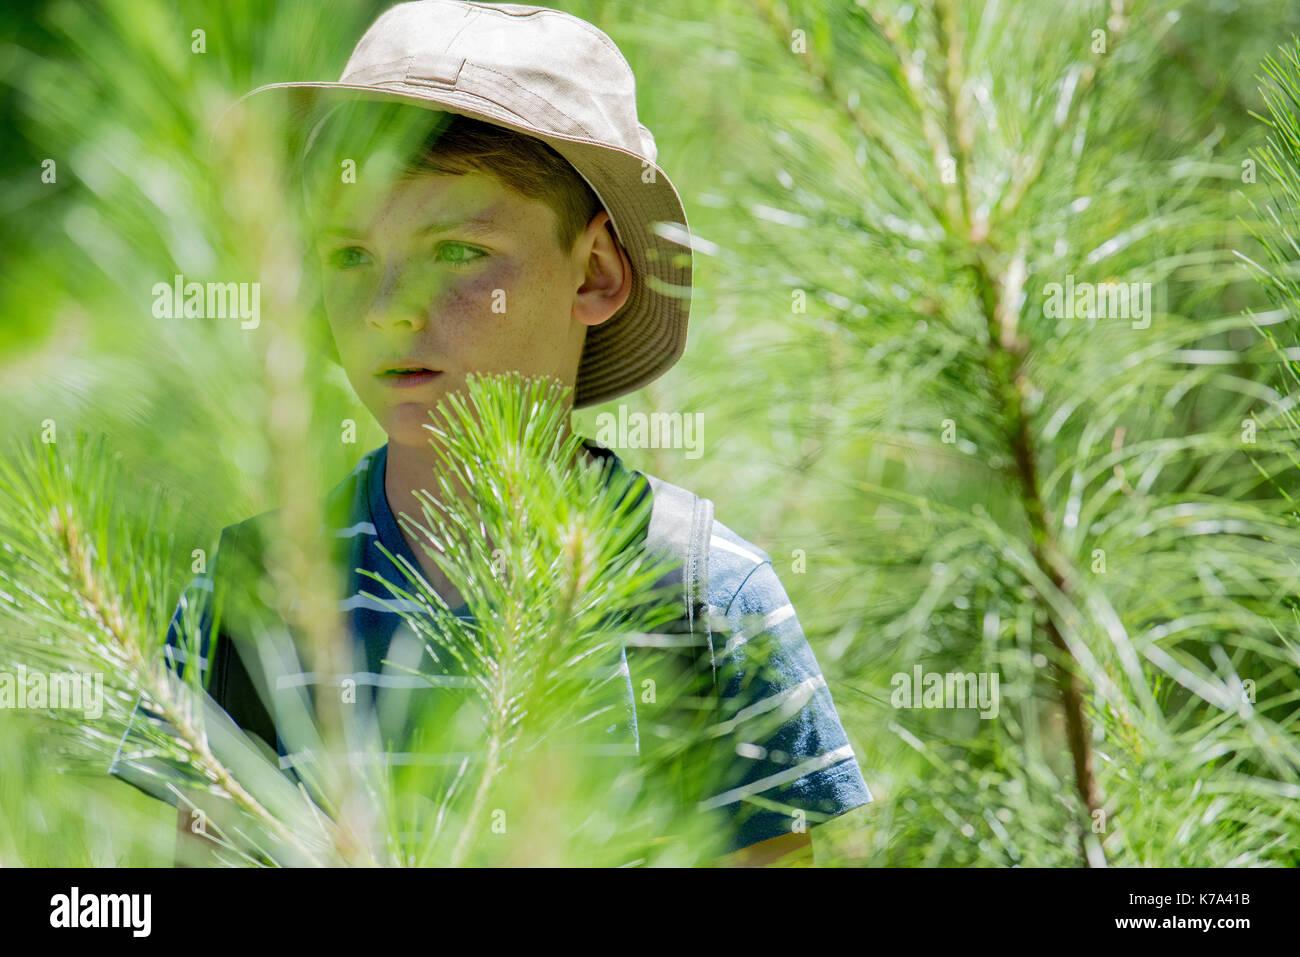 Boy exploring in woods - Stock Image